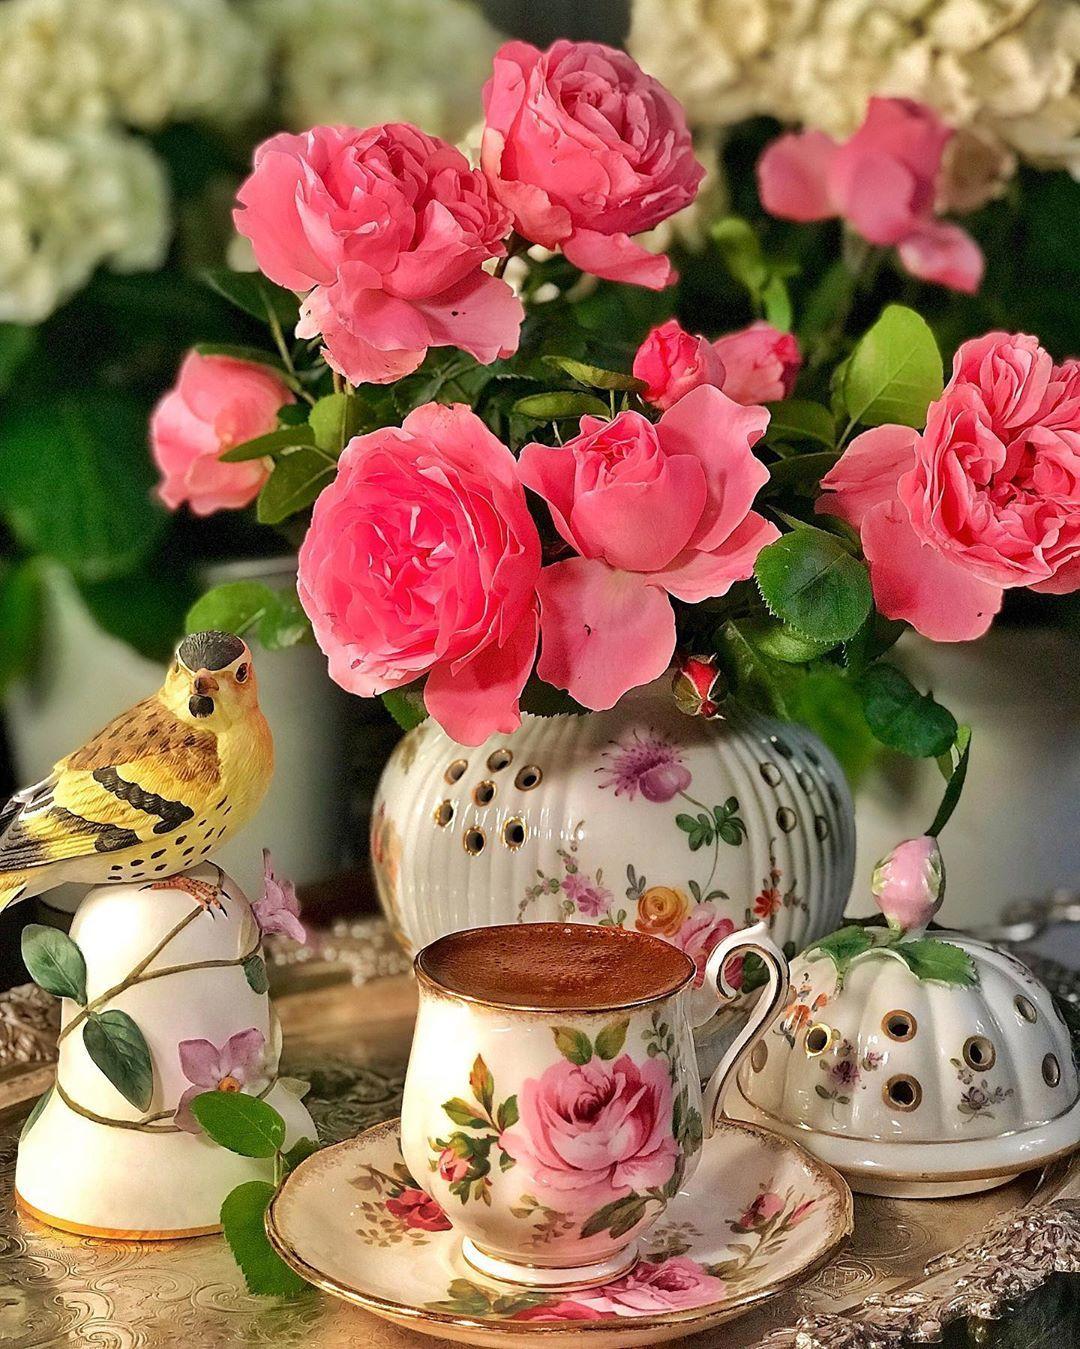 Casnigiran Pe Instagram Keyifli Aksamlar Dilerim Pembe Gulleri Cok Seversin Canim Ozelhulya M Keske Coffee Images Good Morning Coffee Tea Pots